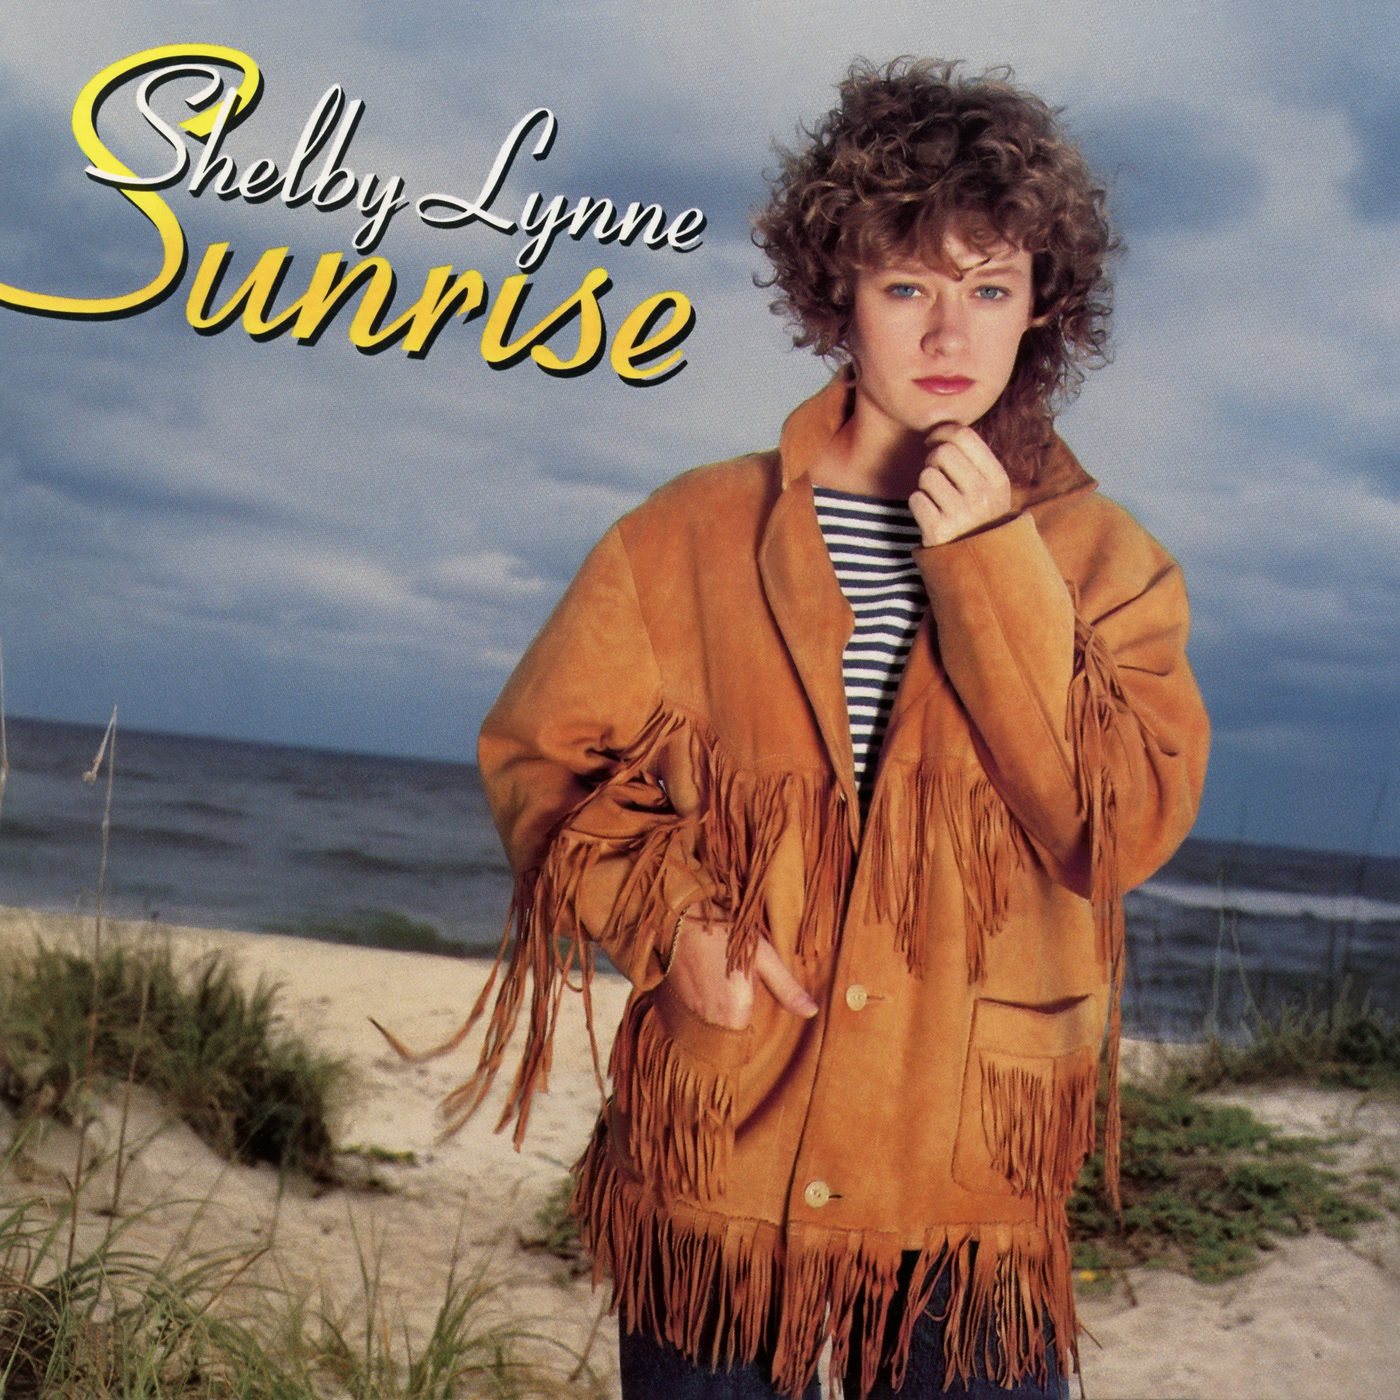 Sunrise - Shelby Lynne